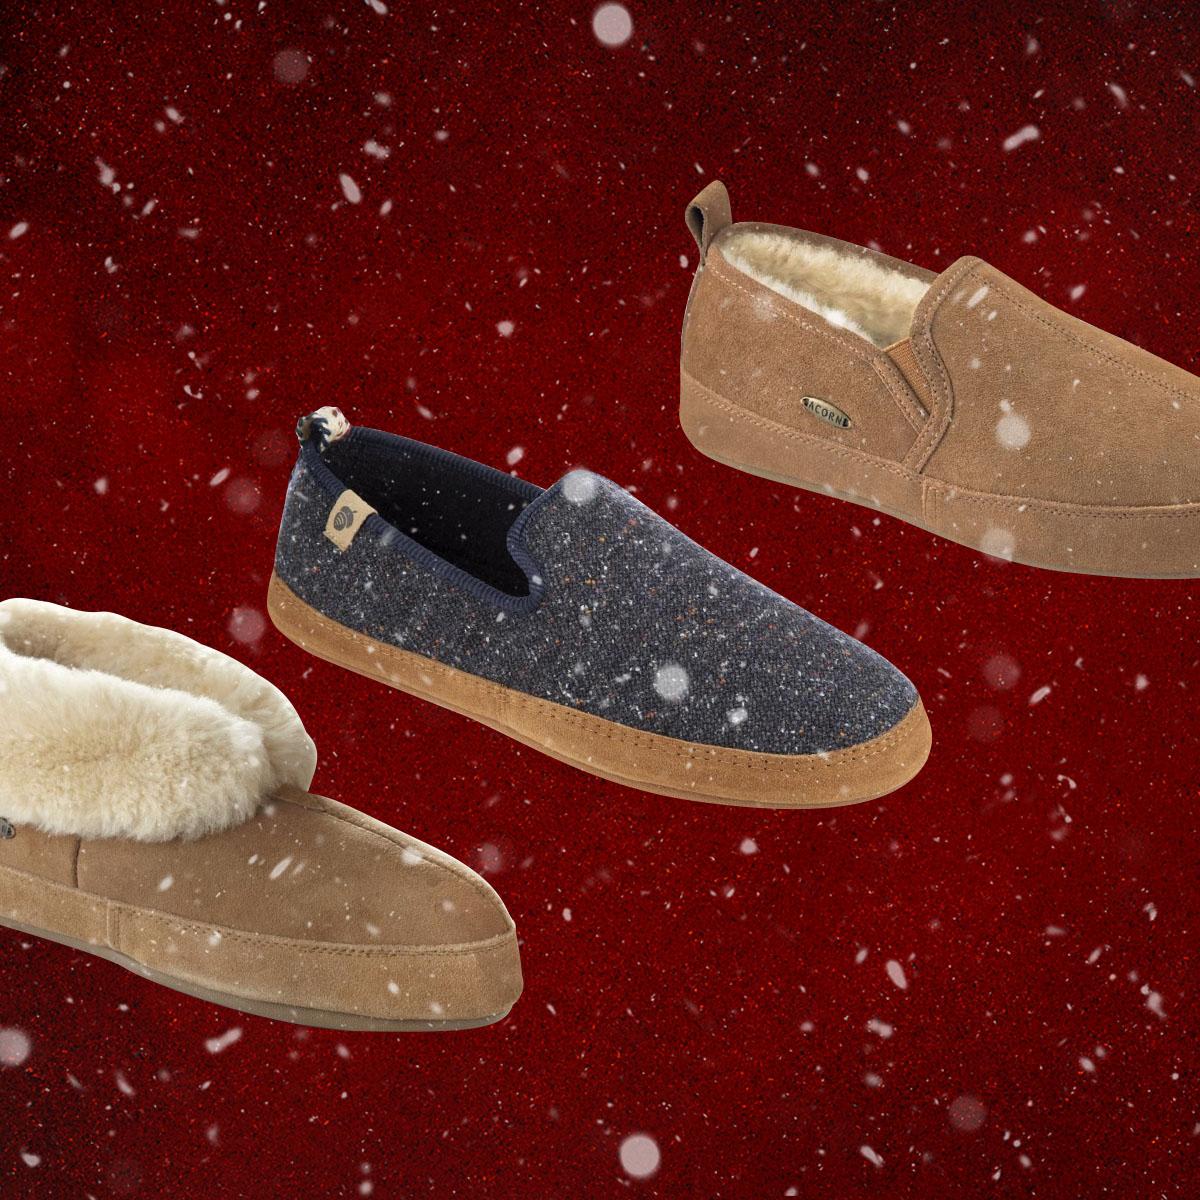 acorn slippers